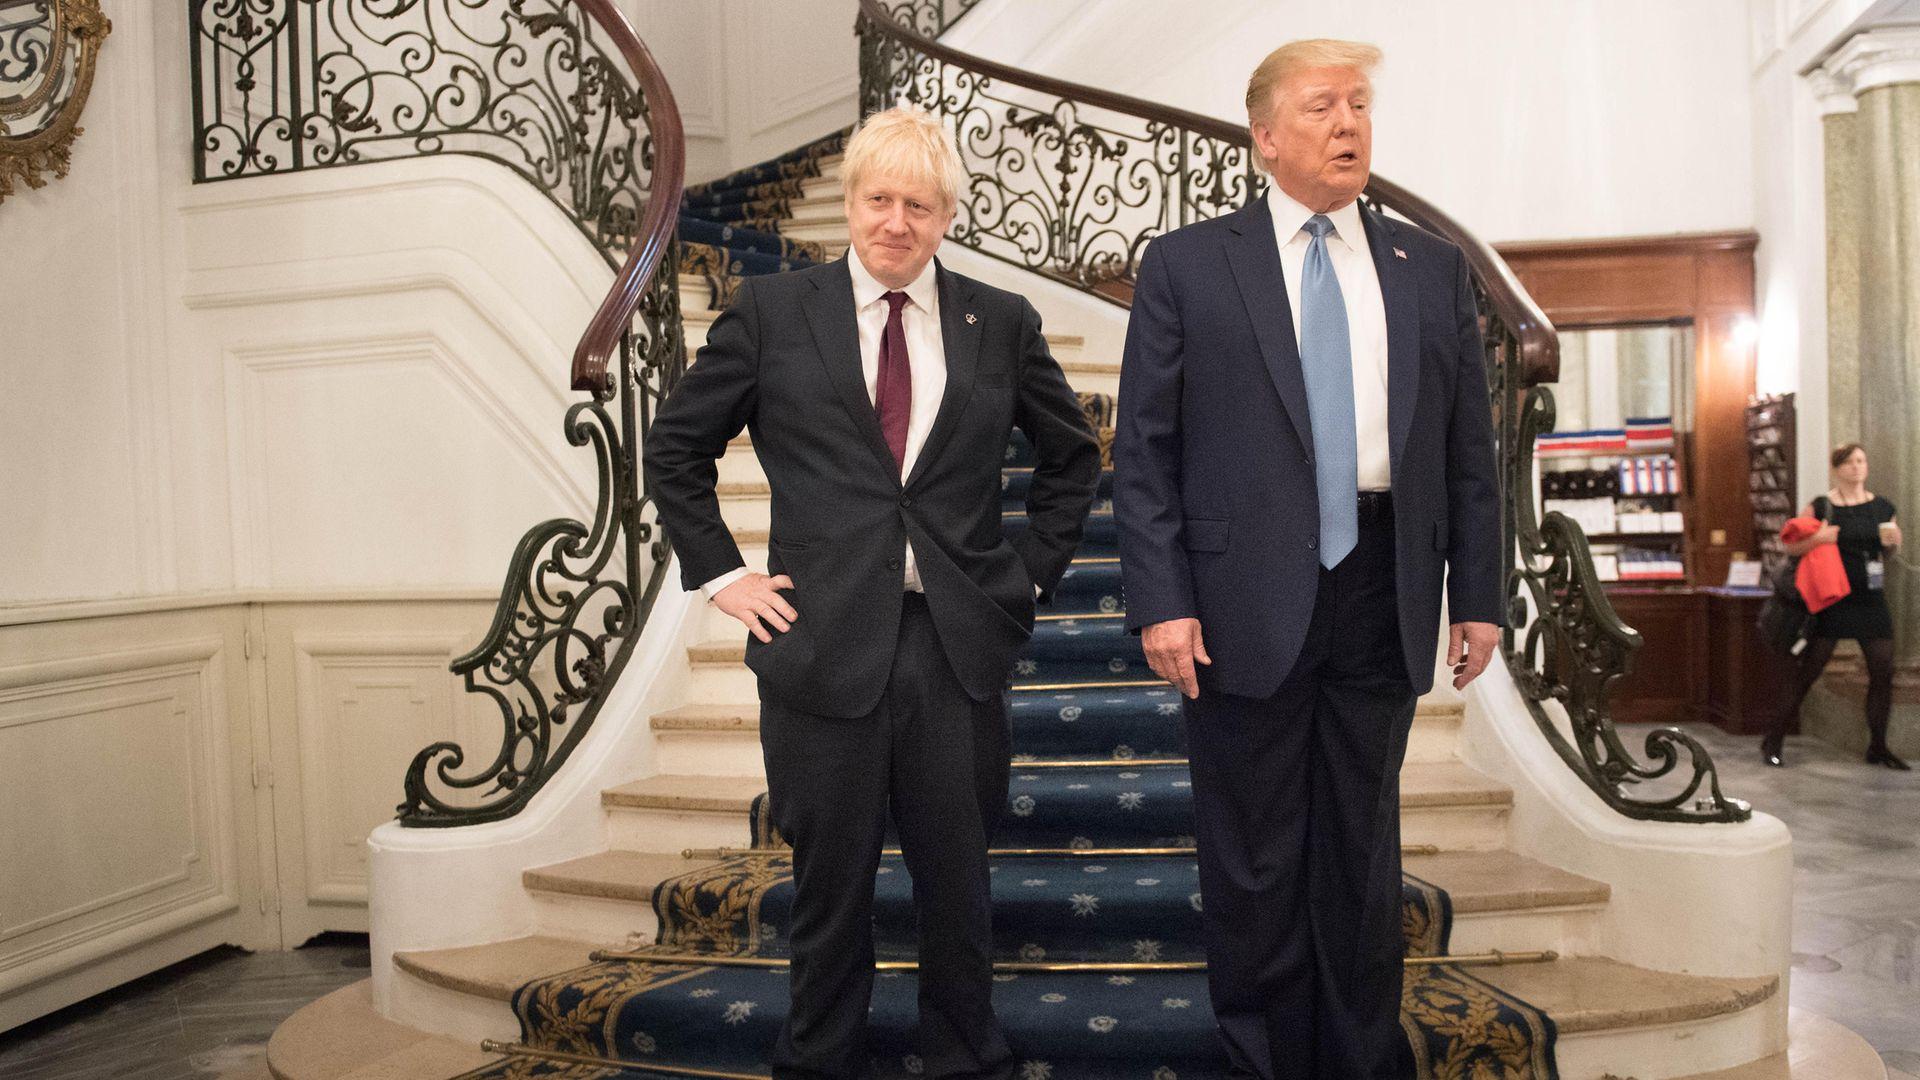 U.S. President Donald Trump and Britain's Prime Minister Boris Johnson - Credit: Getty Images